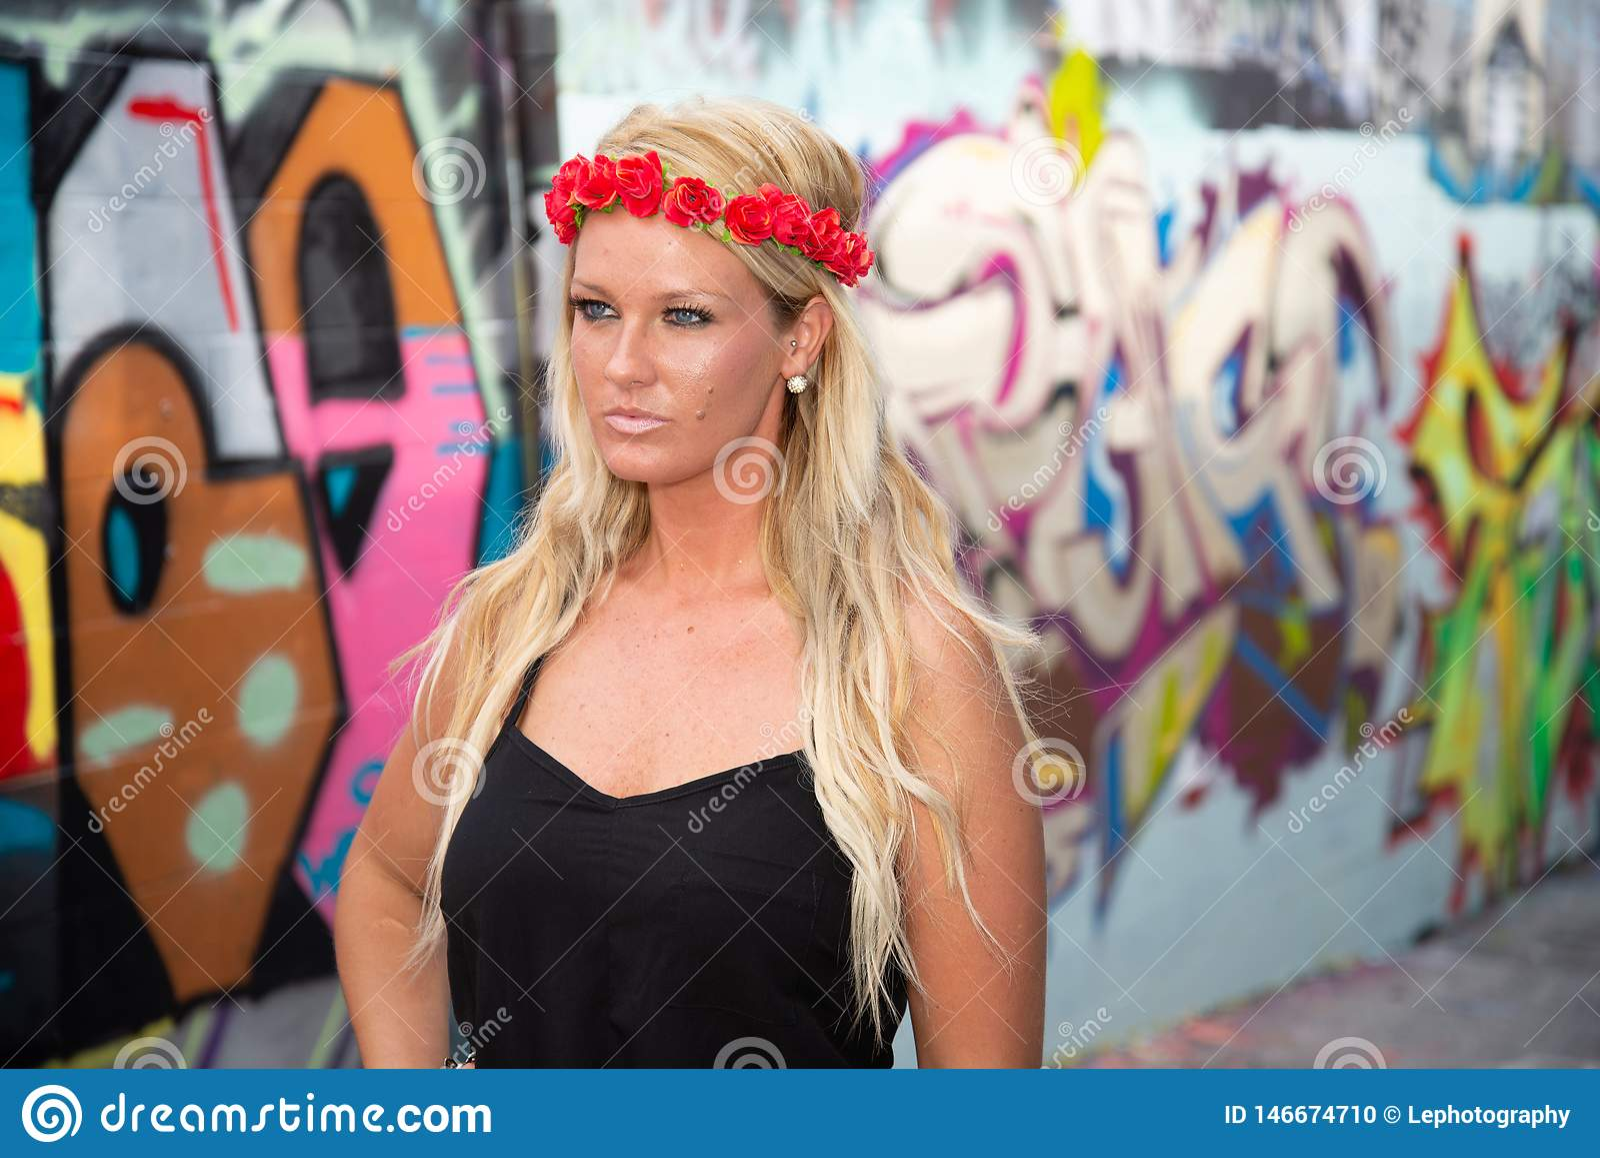 Blonde girl woman